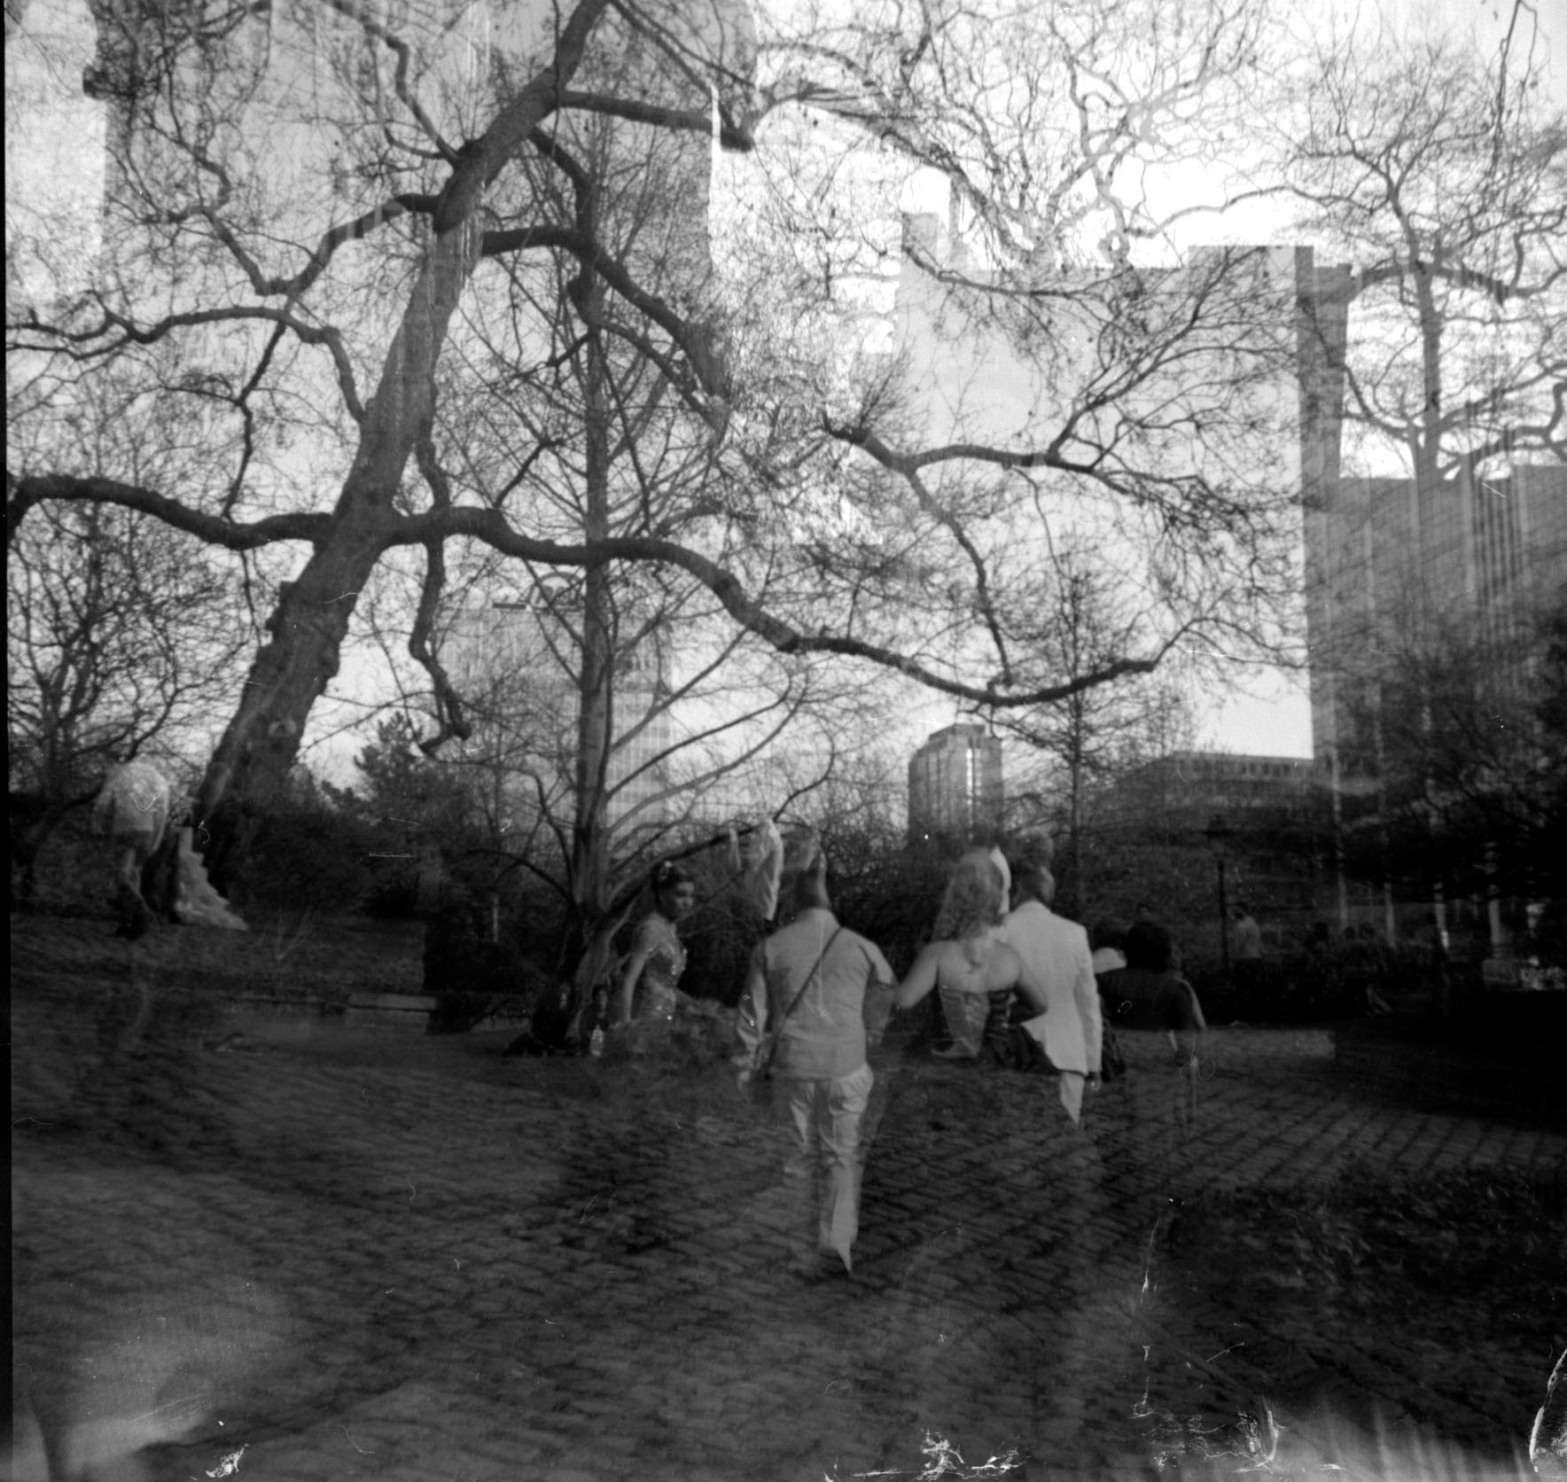 People trees dark ambiance